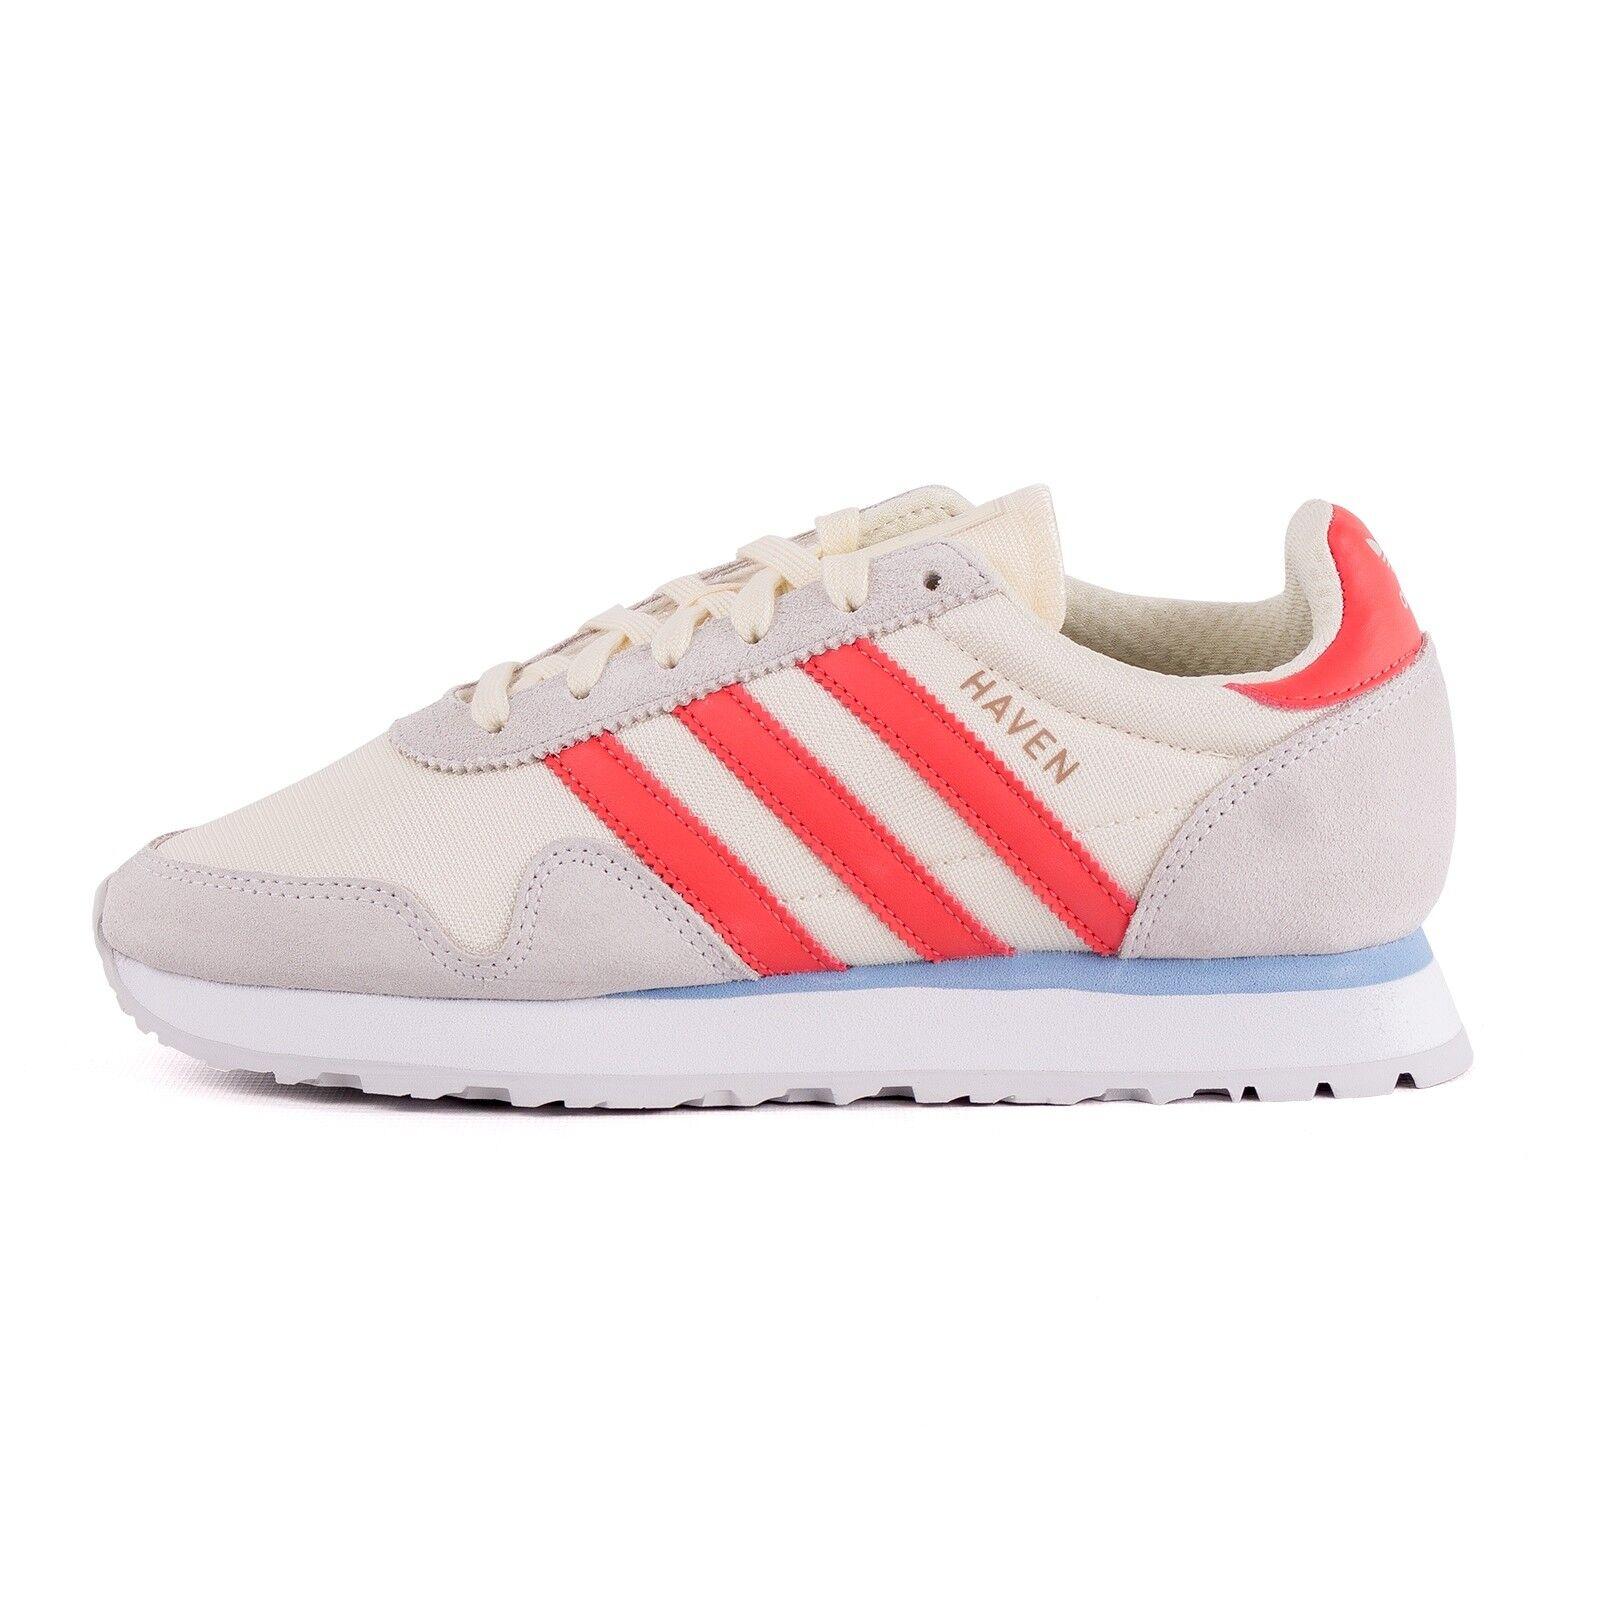 Adidas Haven W Damenschuh Turnschuhe cream weiss 51354